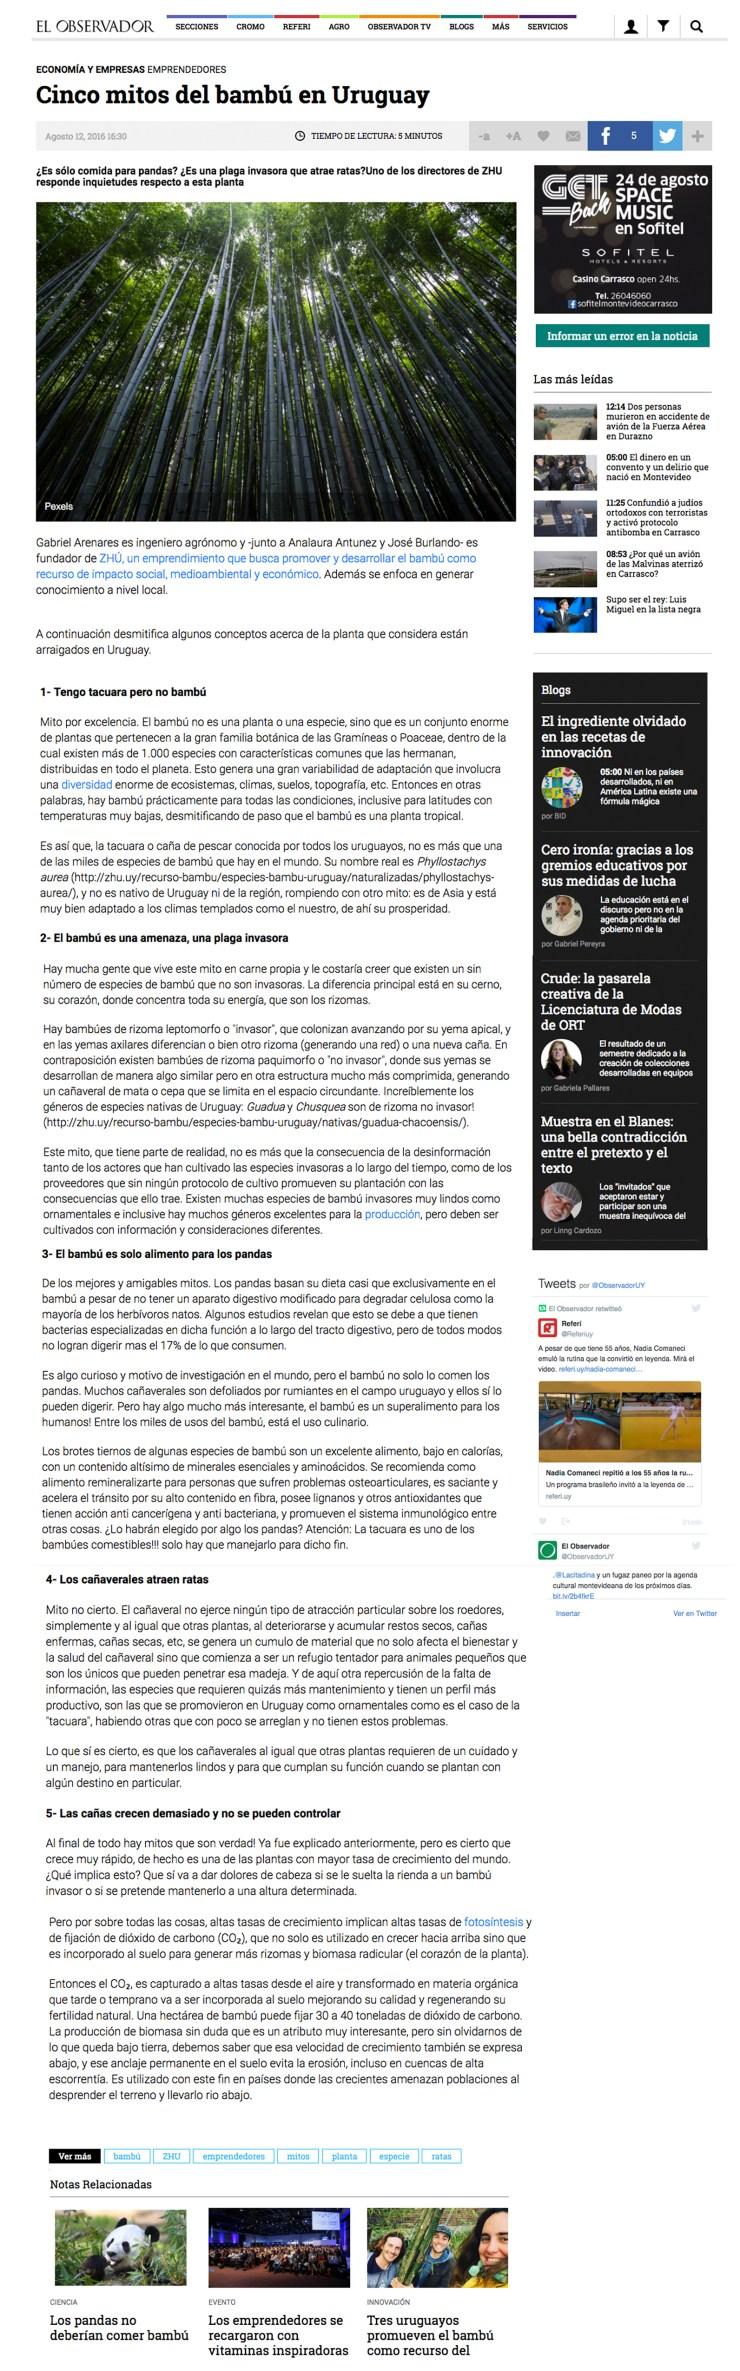 Mitos_Bambu_12.08.16